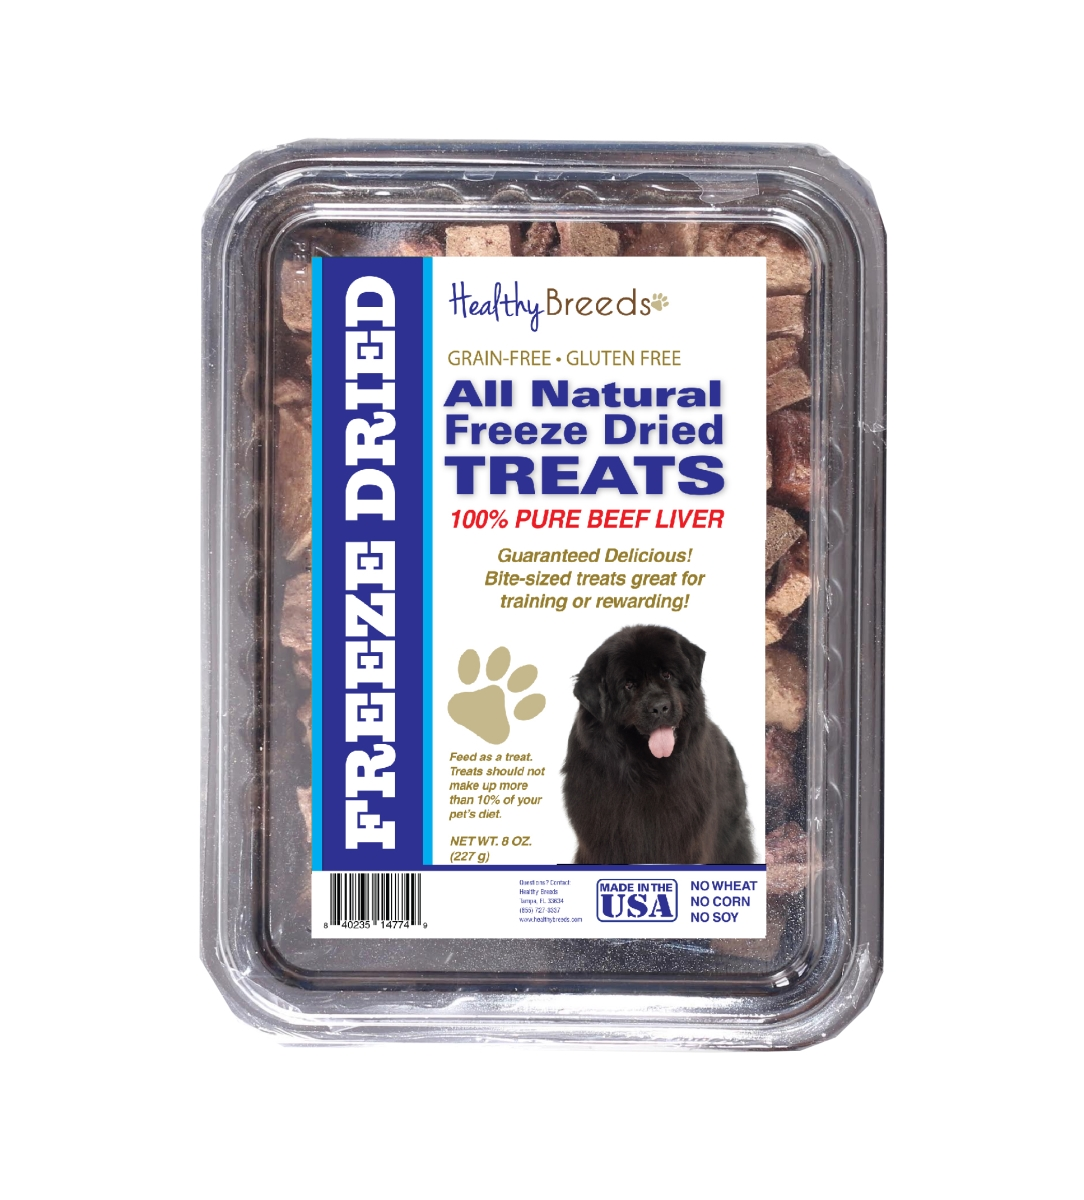 Healthy Breeds 840235147626 10 oz Newfoundland All Natural Freeze Dried Treats Beef Liver